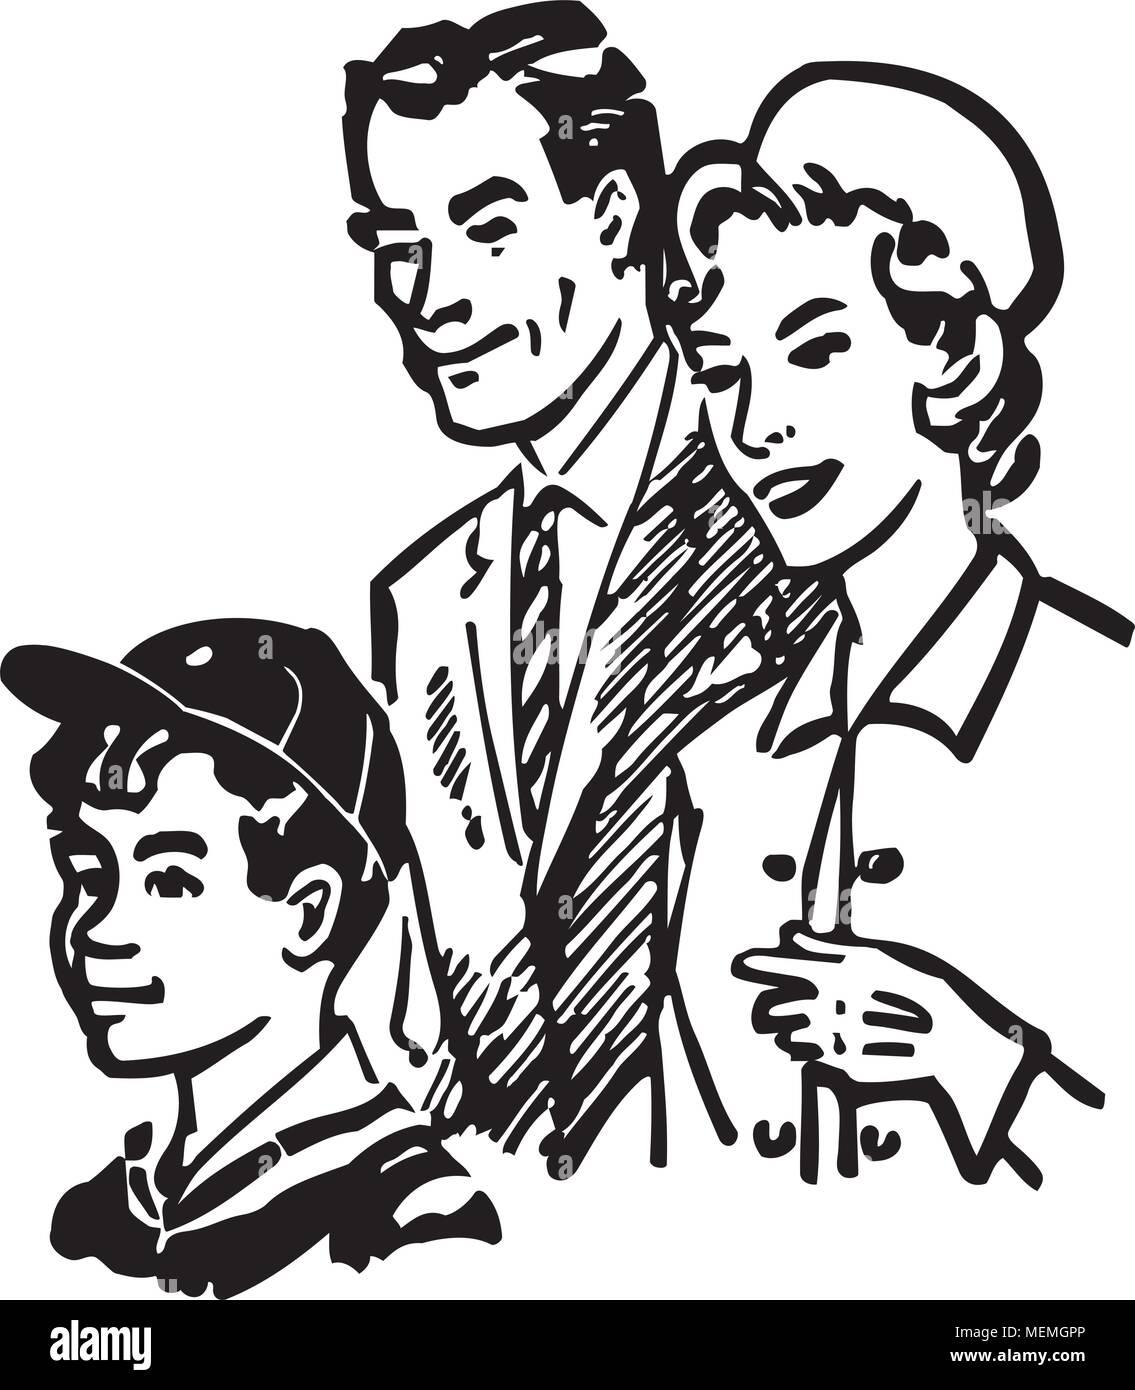 hight resolution of family of three retro clipart illustration